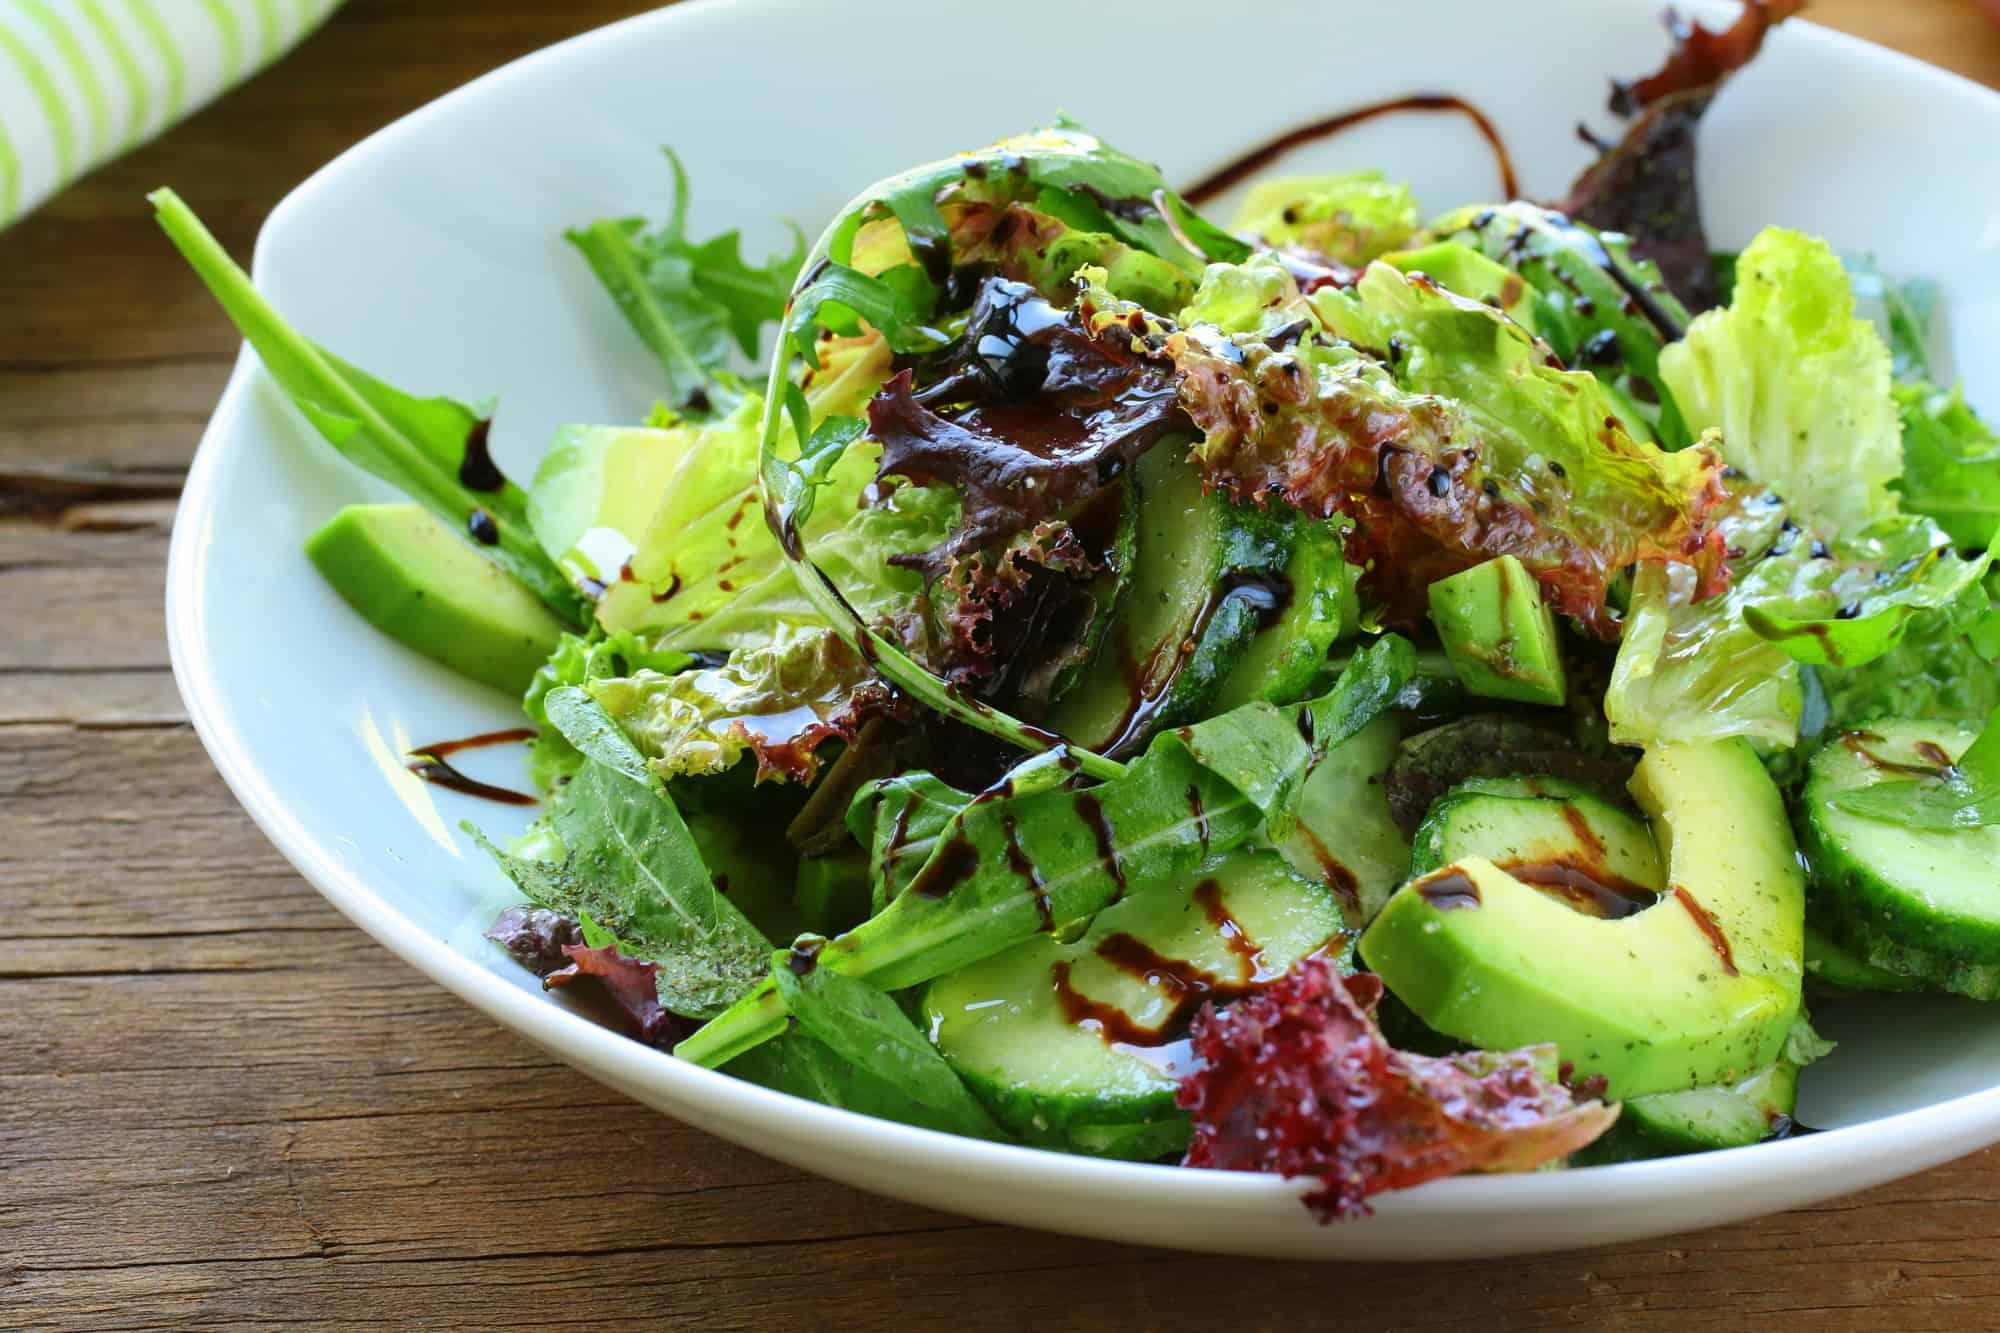 organic salad with avocado and balsamic dressing